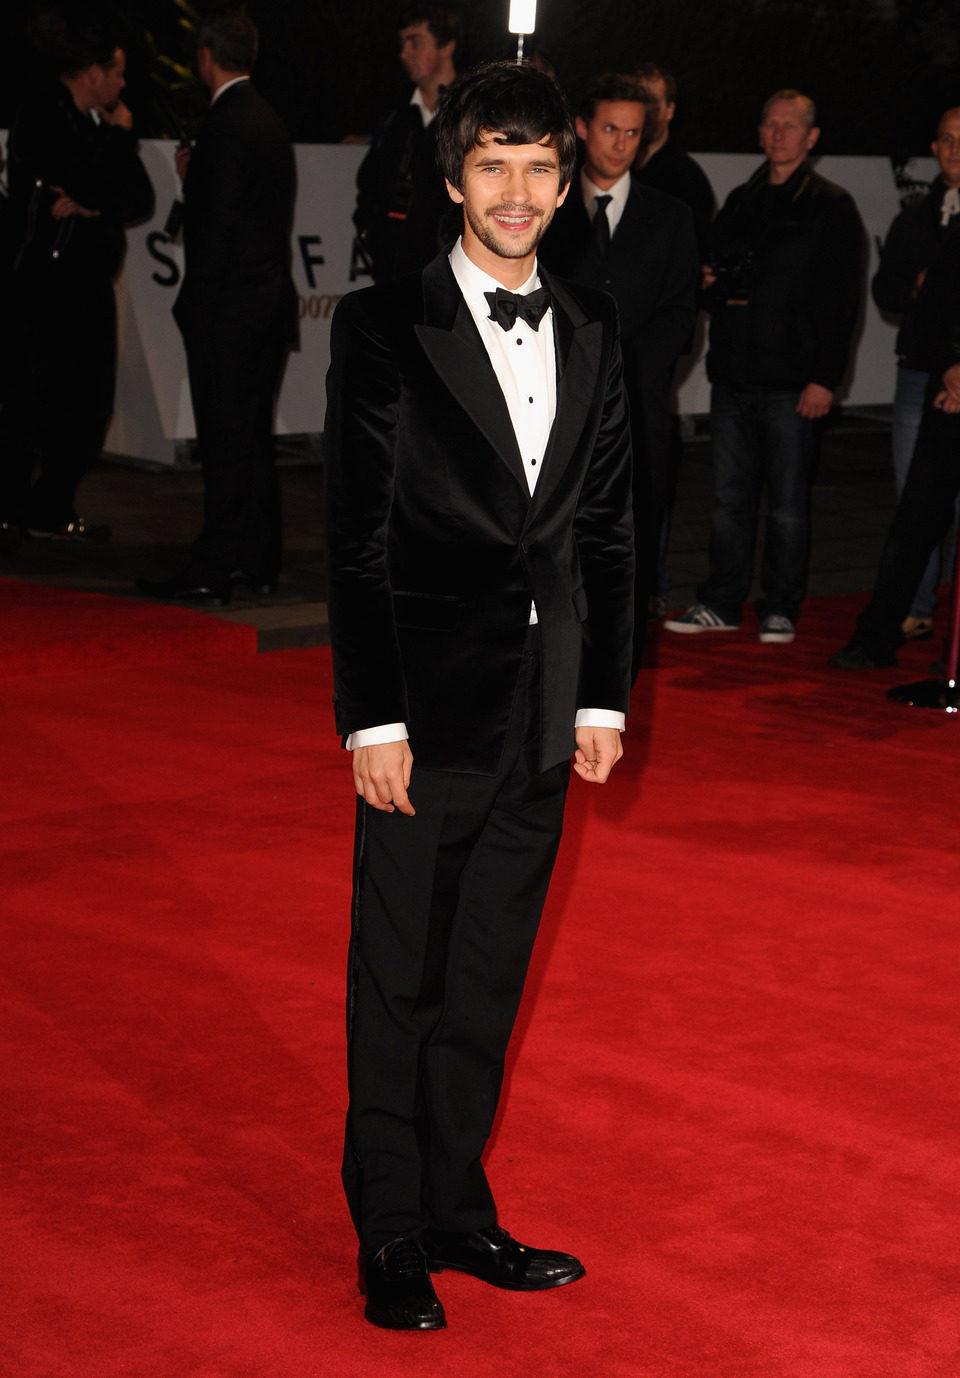 Ben Whishaw en la premiere mundial de 'Skyfall' en Londres